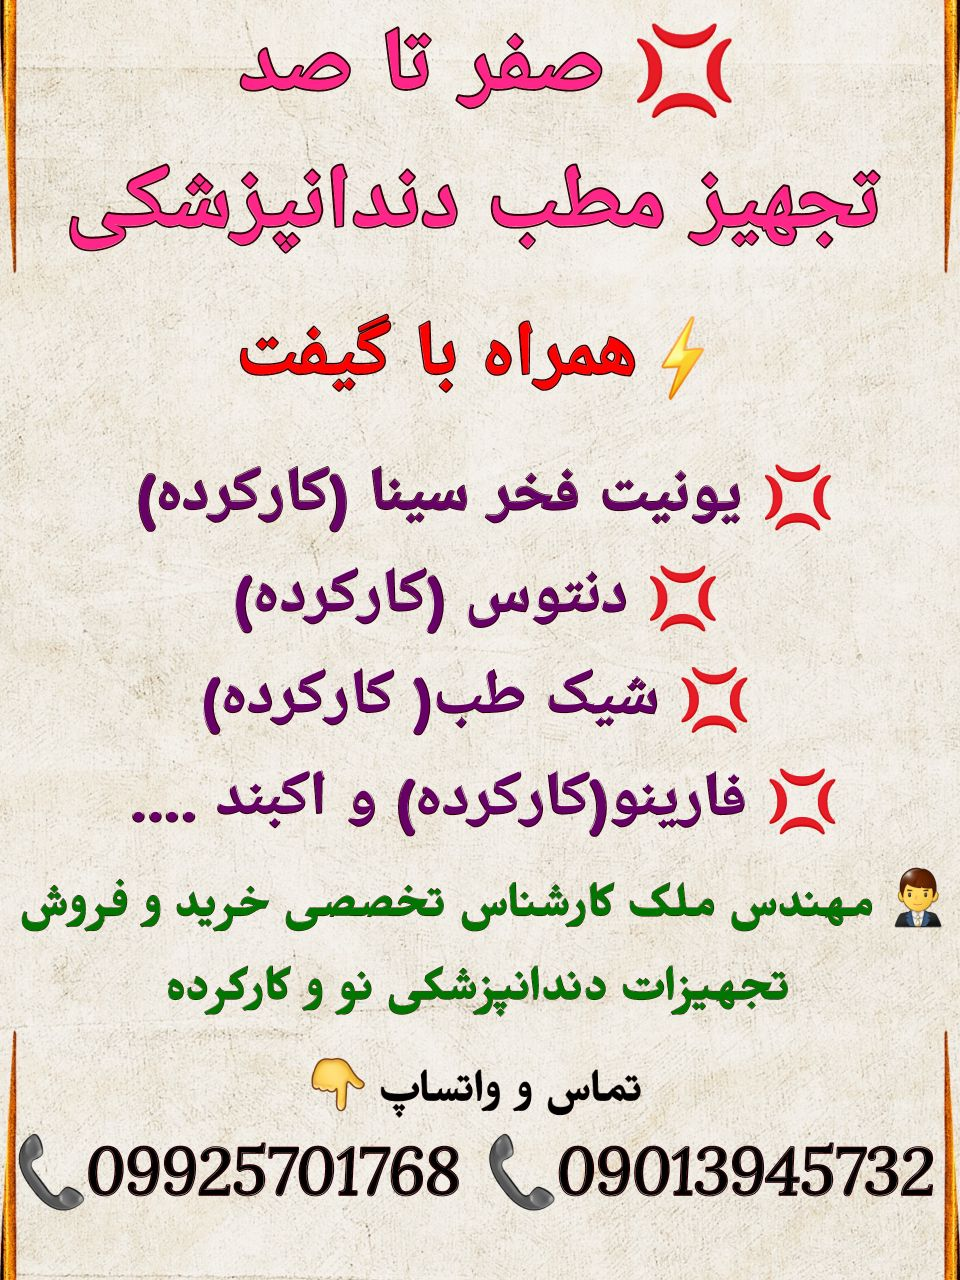 تهران: صفر تا صد تجهیز مطب دندانپزشکی